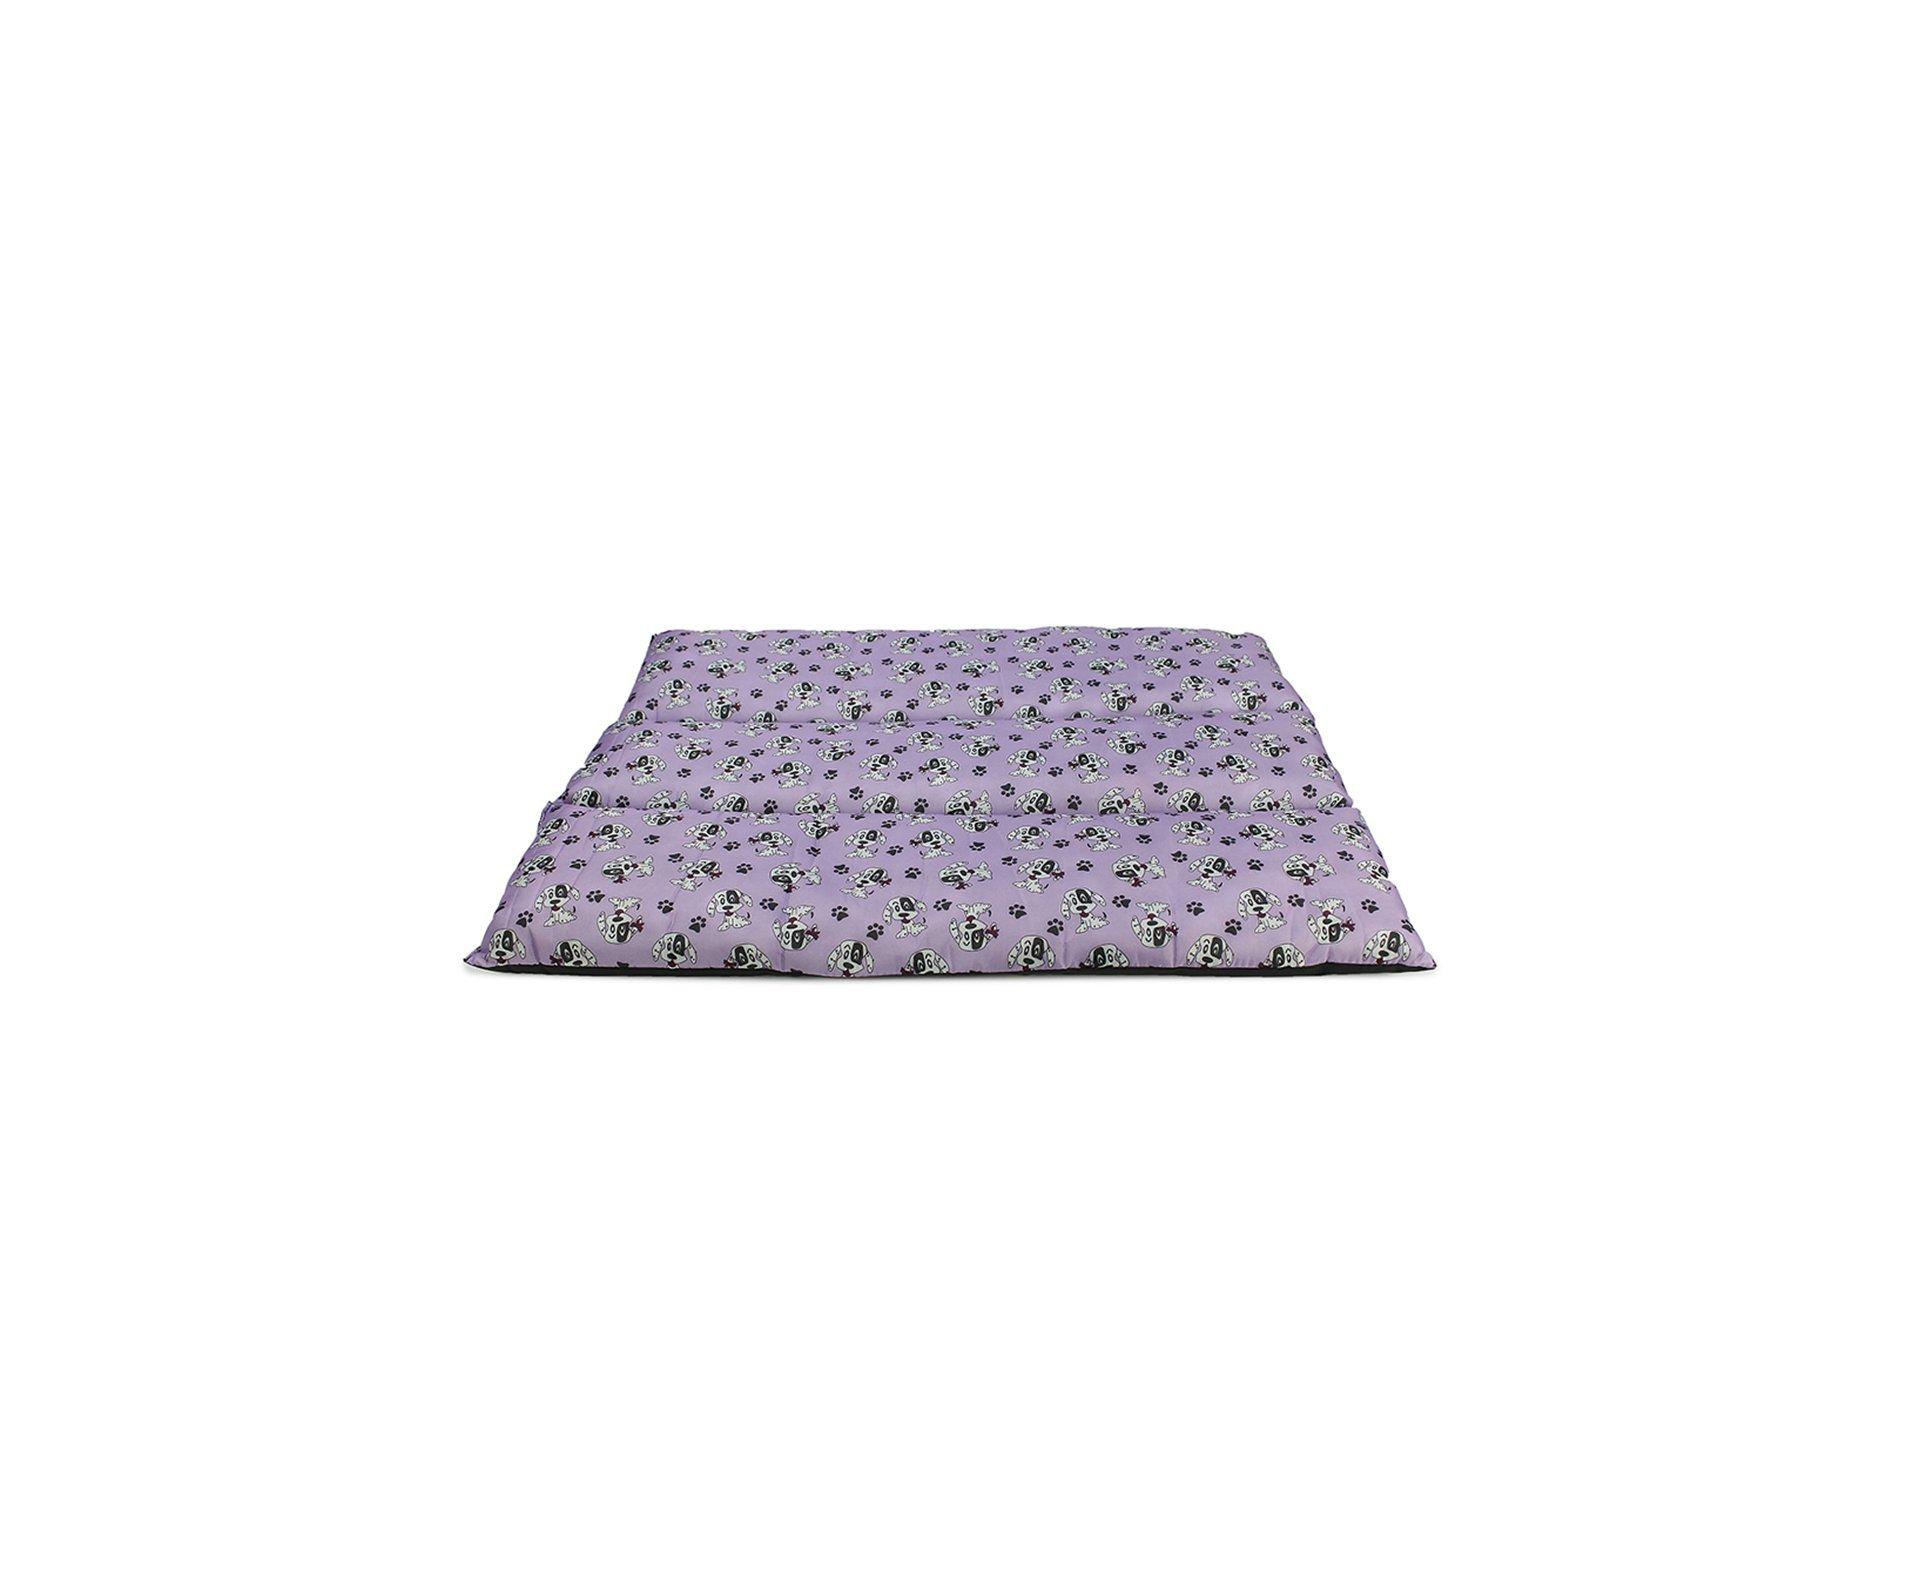 Almofada De Nylon N3 G 80x60cm Lilás - Furacãopet